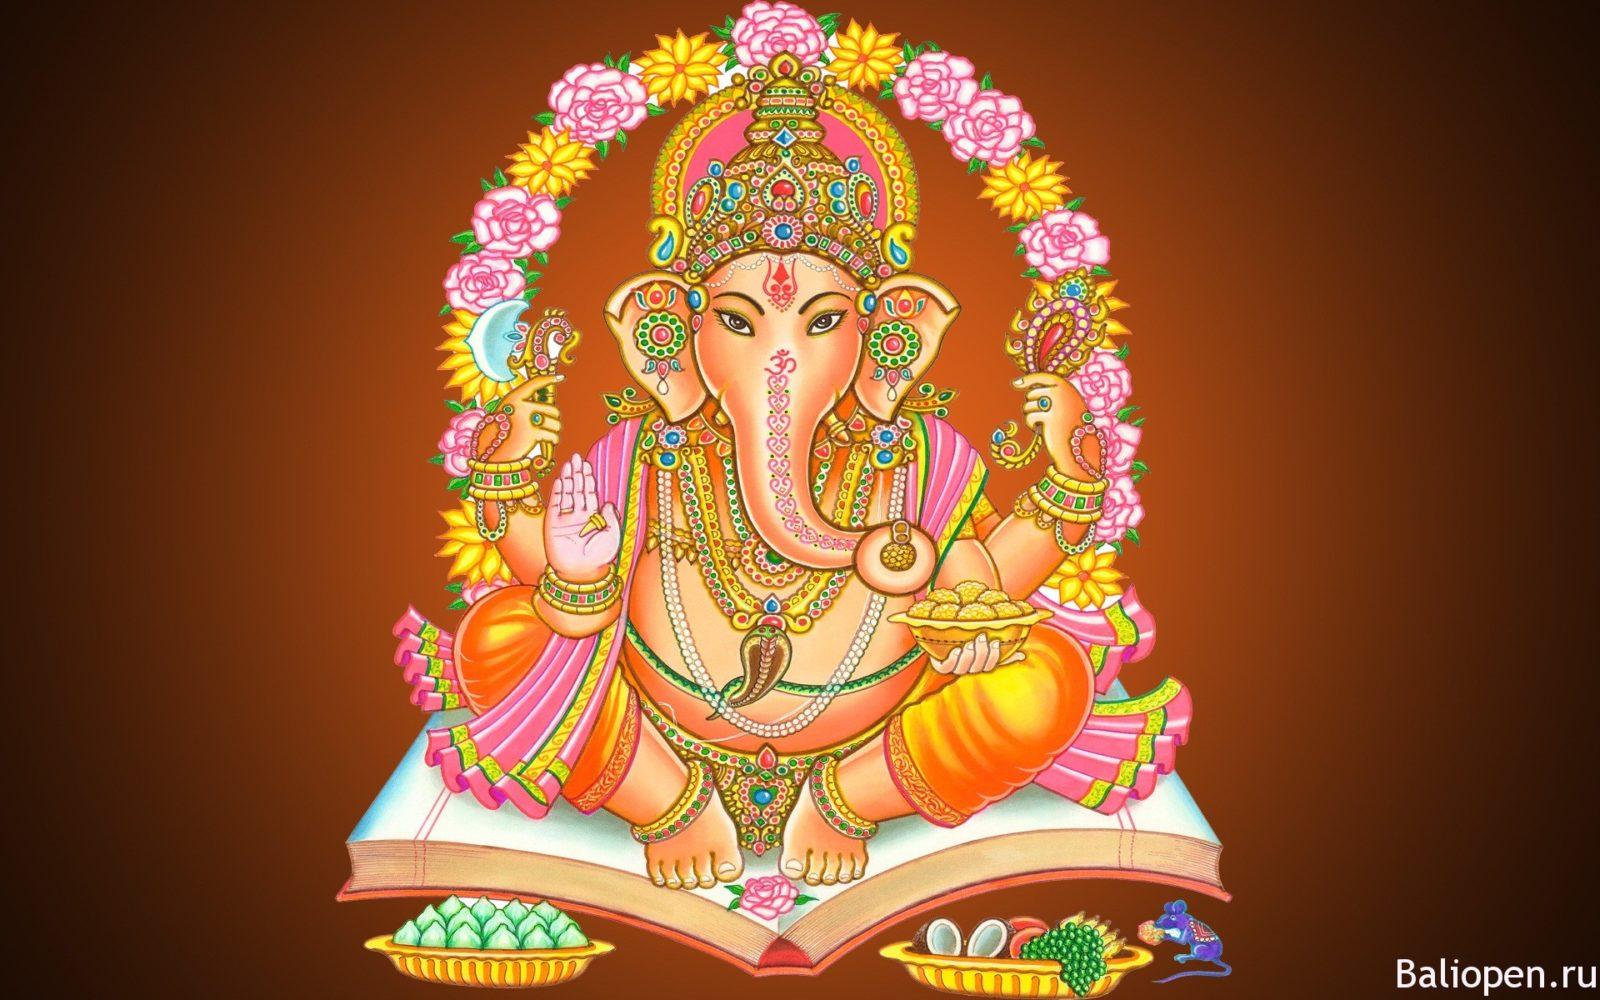 Ганеша - мудрый бог, устраняющий препятствия. Любимец балийцев.